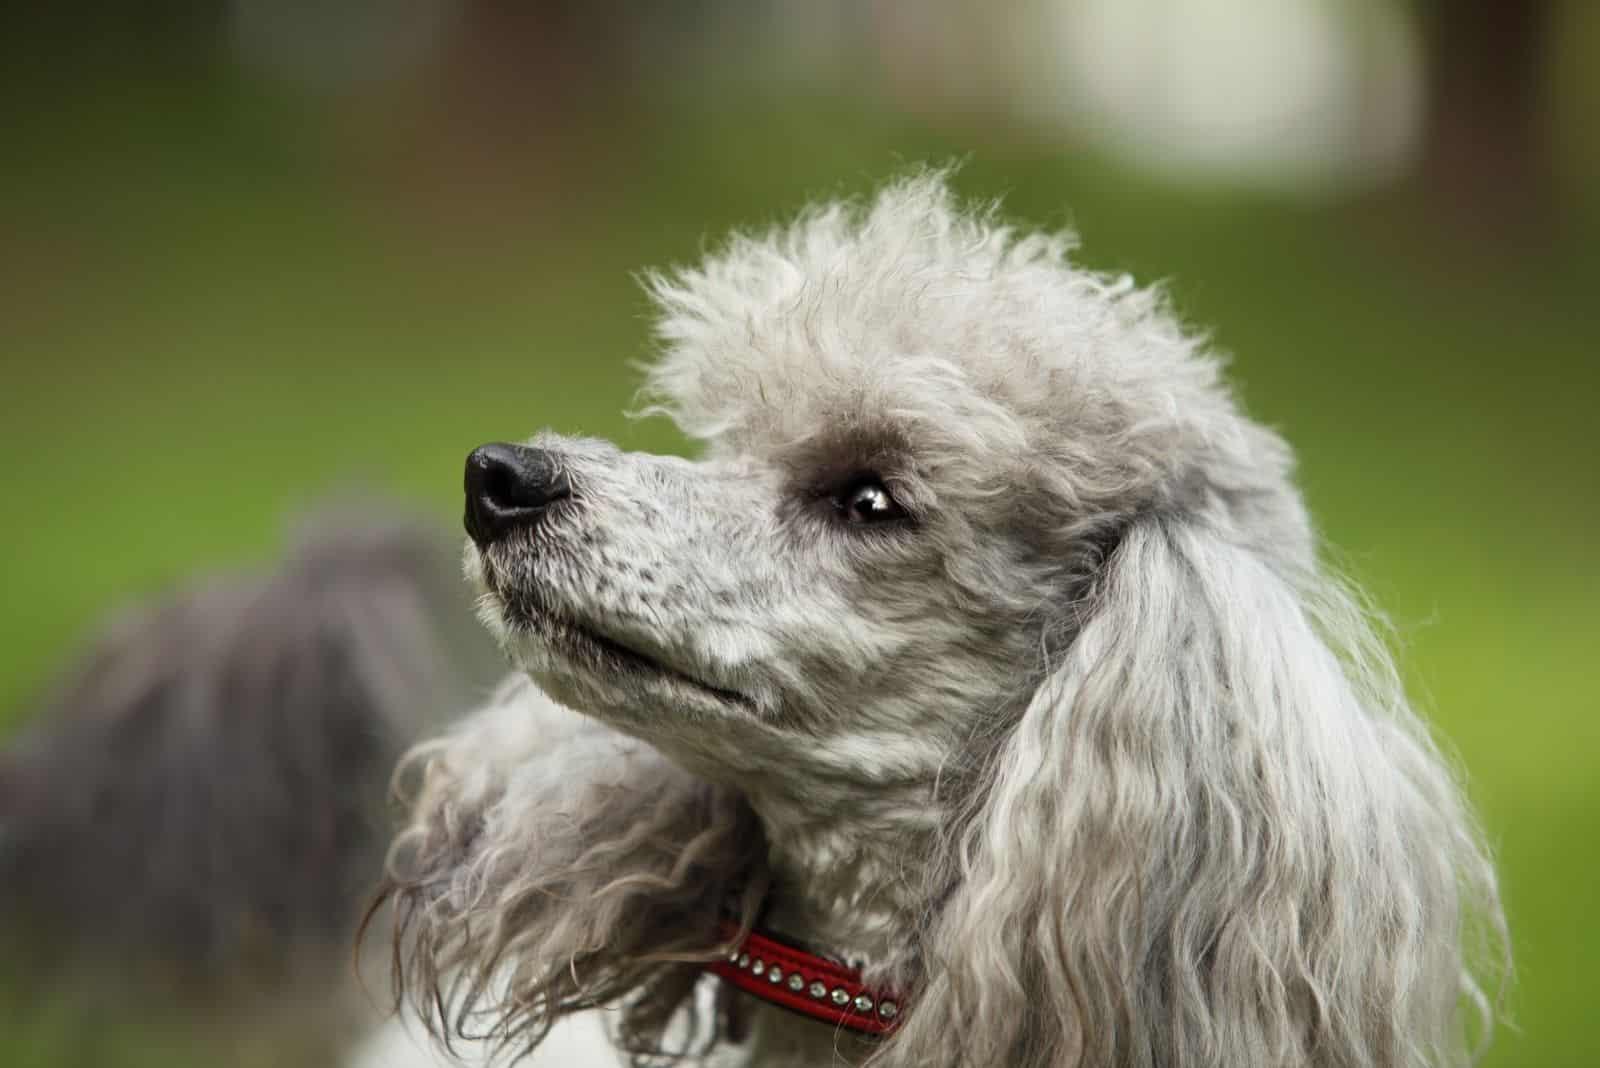 alert cute poodle with big ears looking up